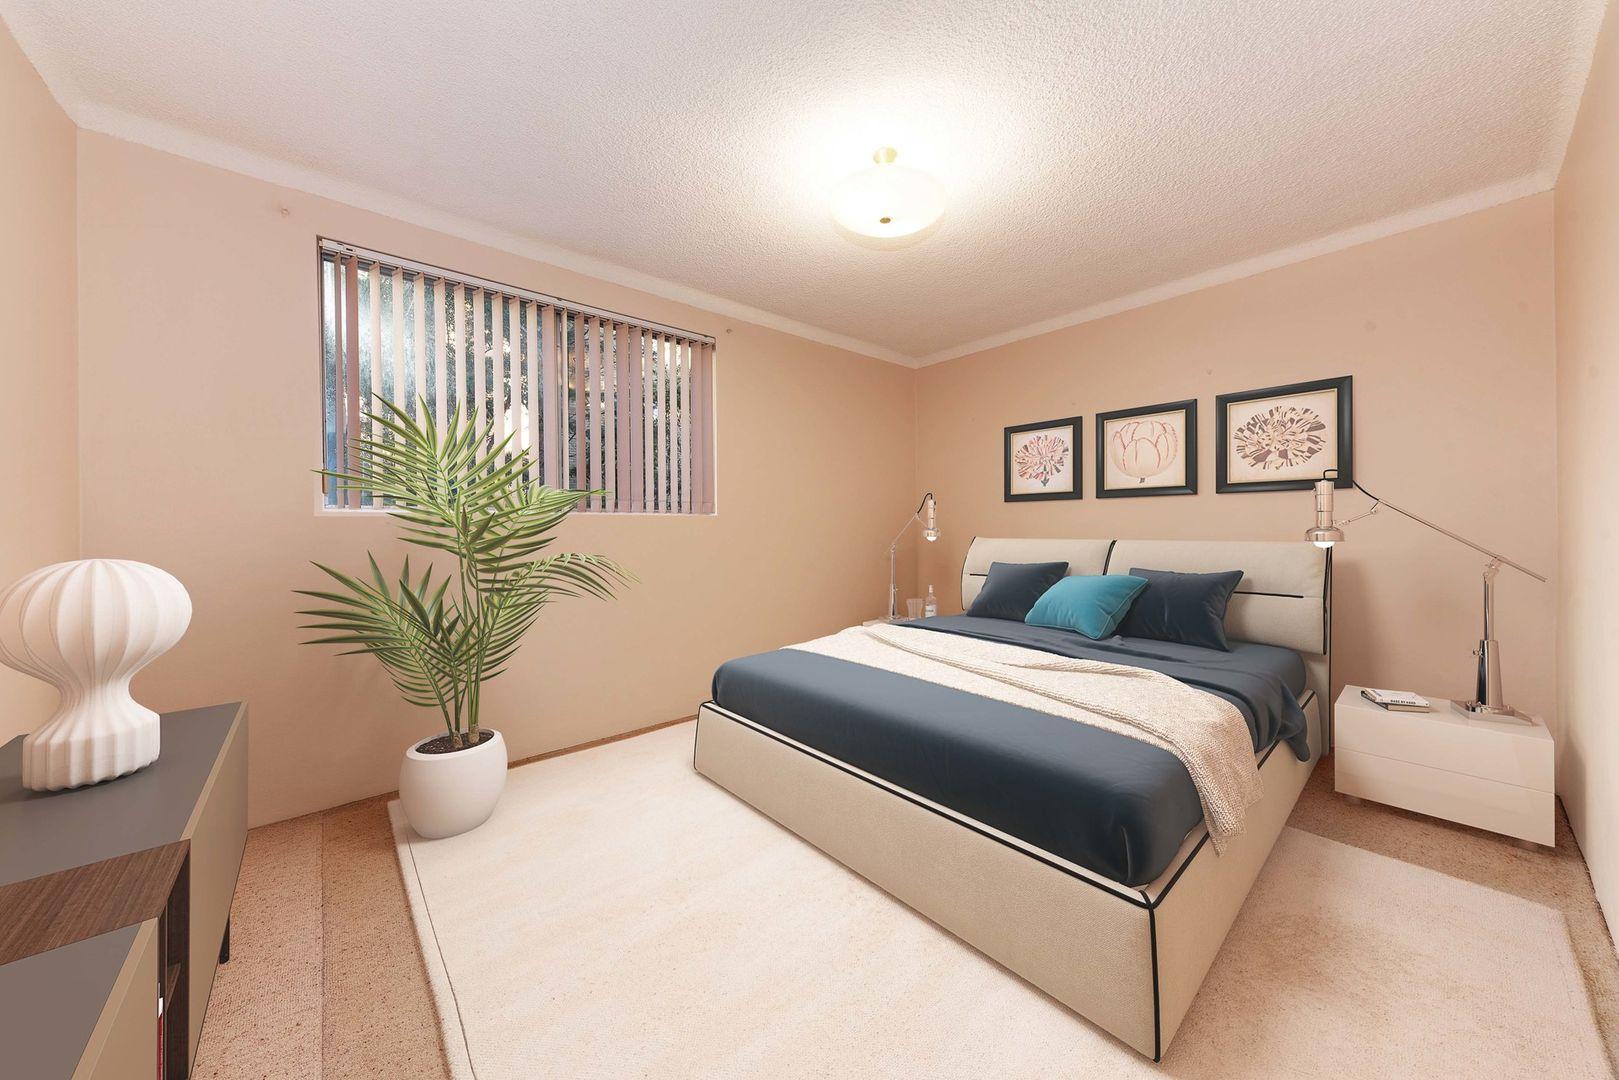 5/6 Murray Street, Lane Cove North NSW 2066, Image 2